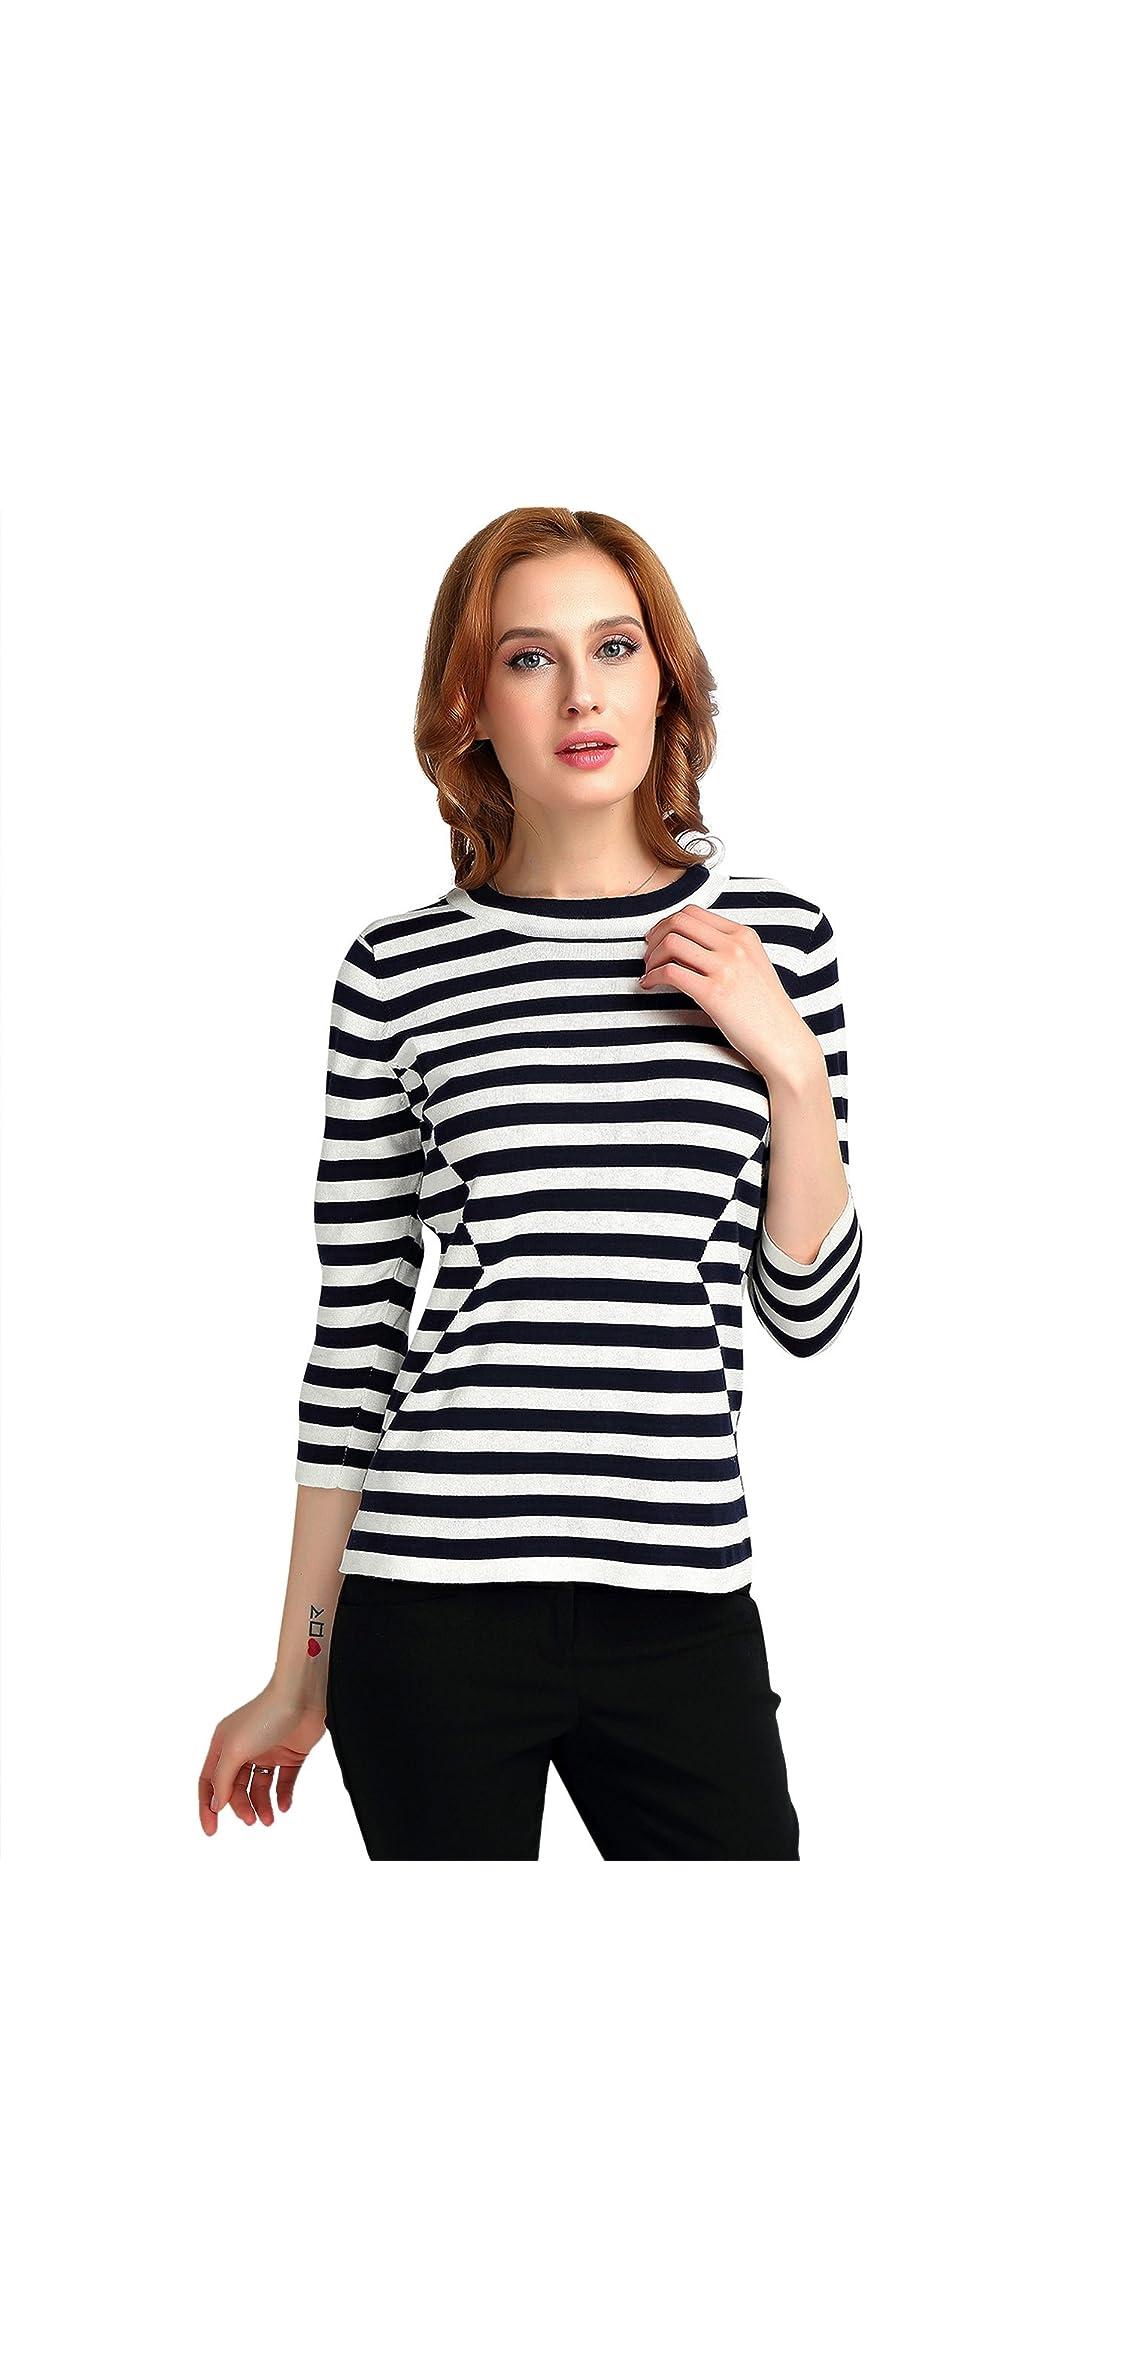 Black White Stripe Top Sweater / Sleeves For Women